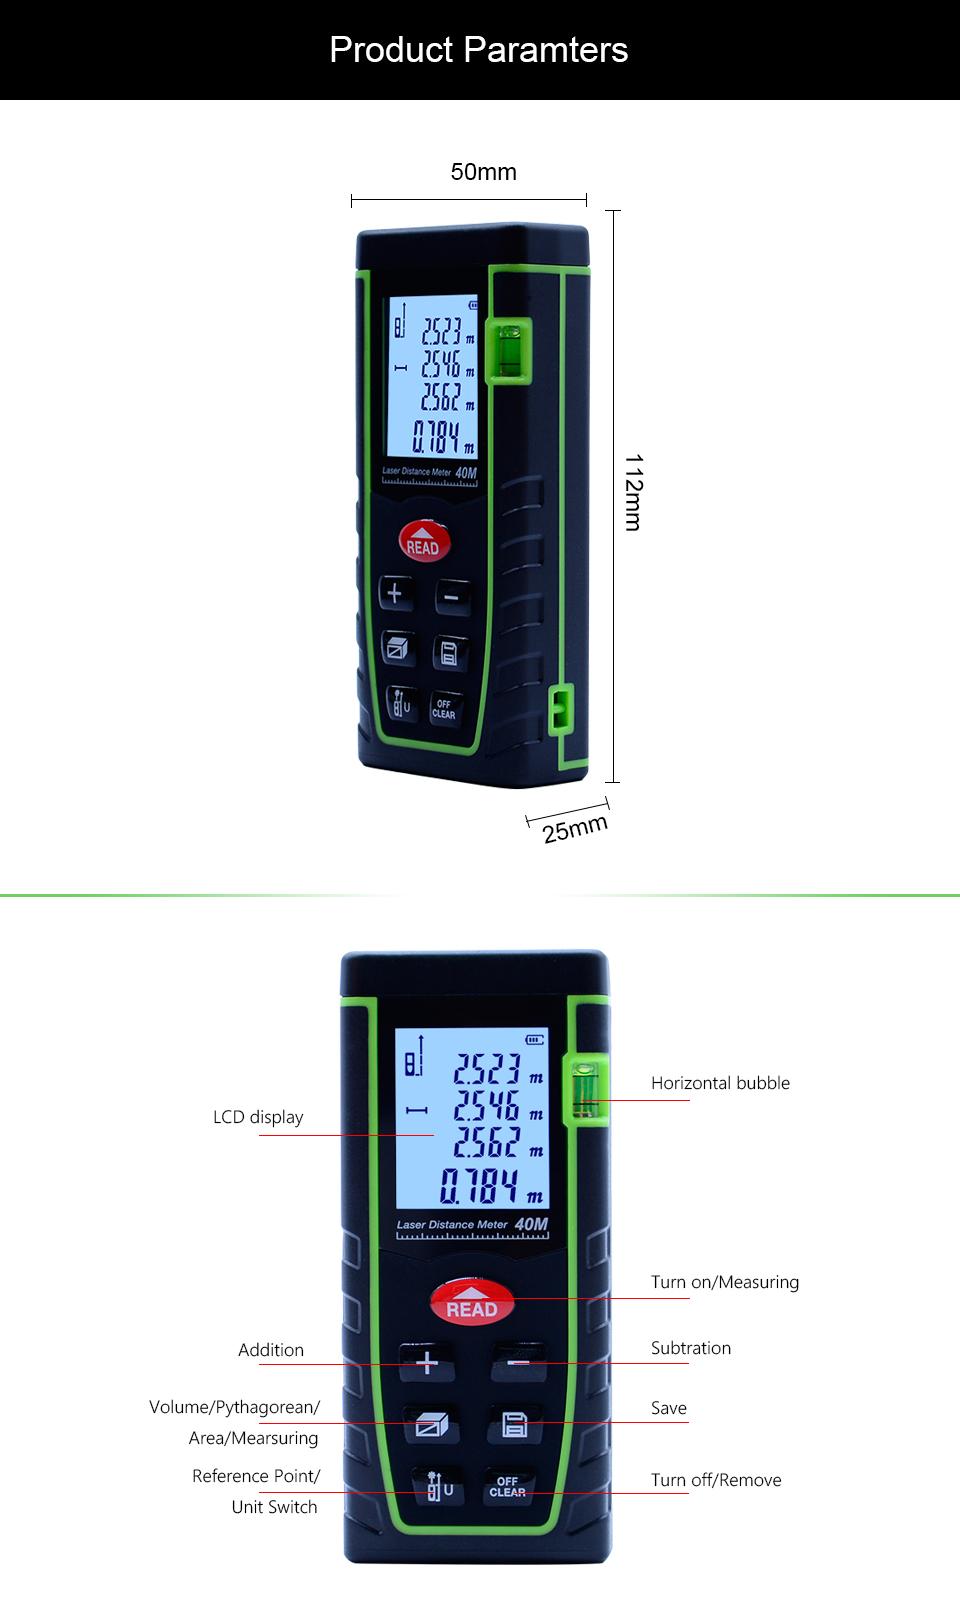 laser distance meter 40m (3)